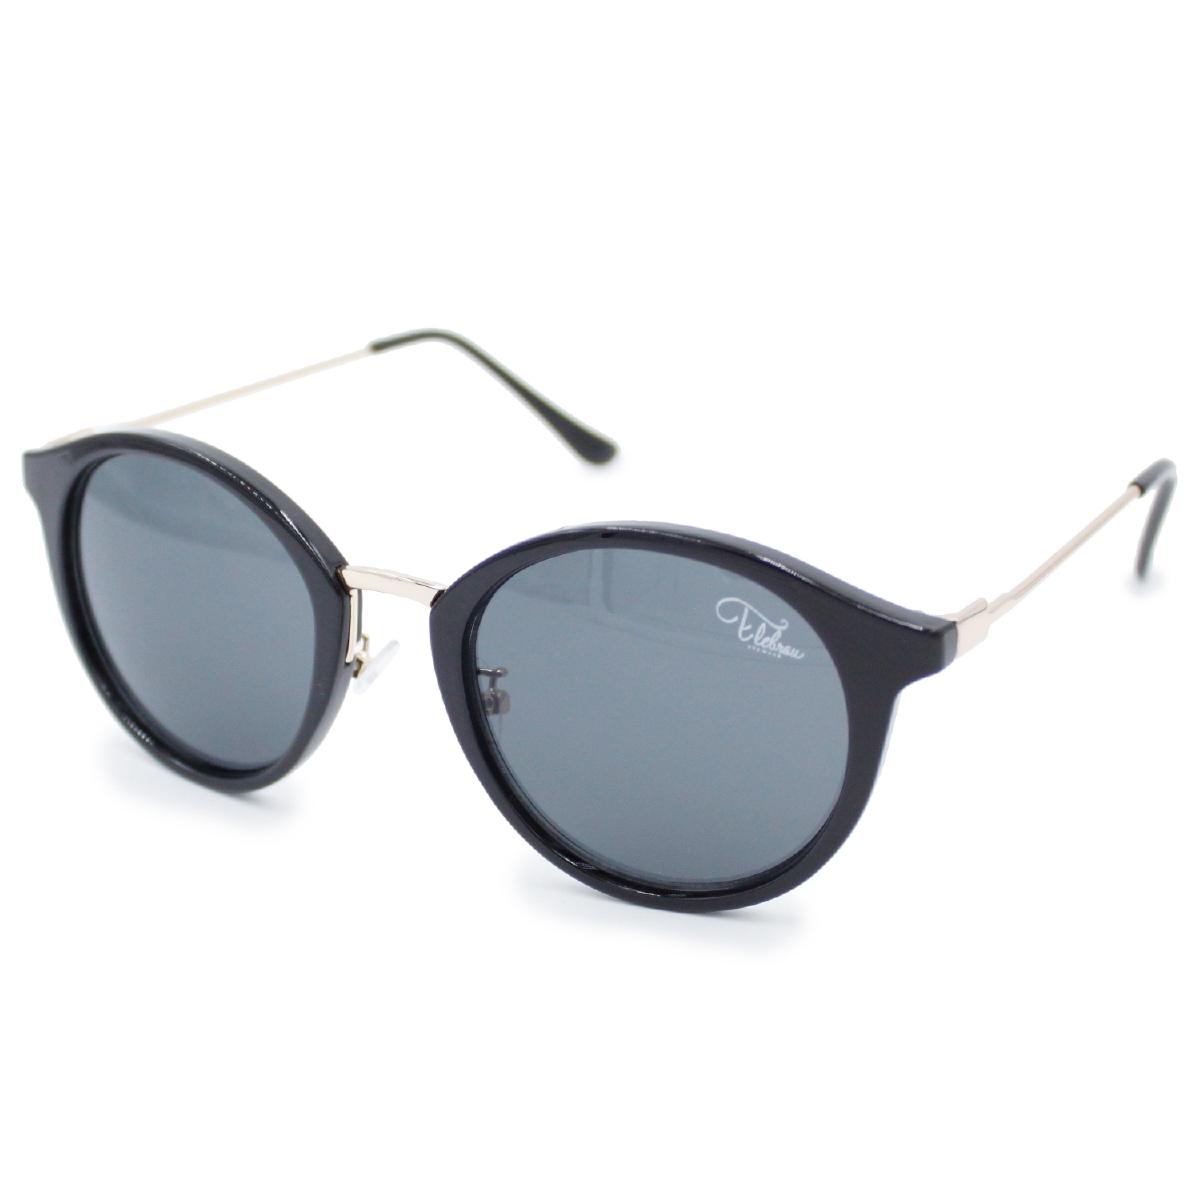 ELEBROU eyewear エレブロ QUEENS Black